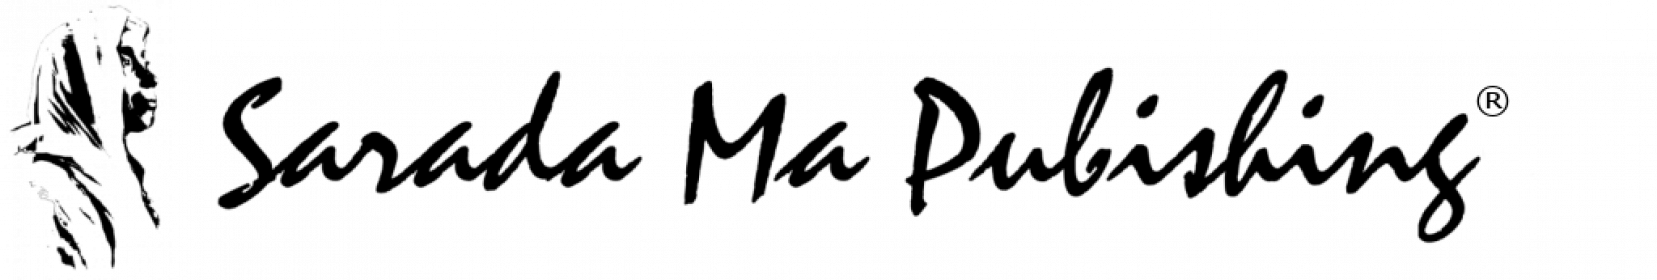 logo edit sarada